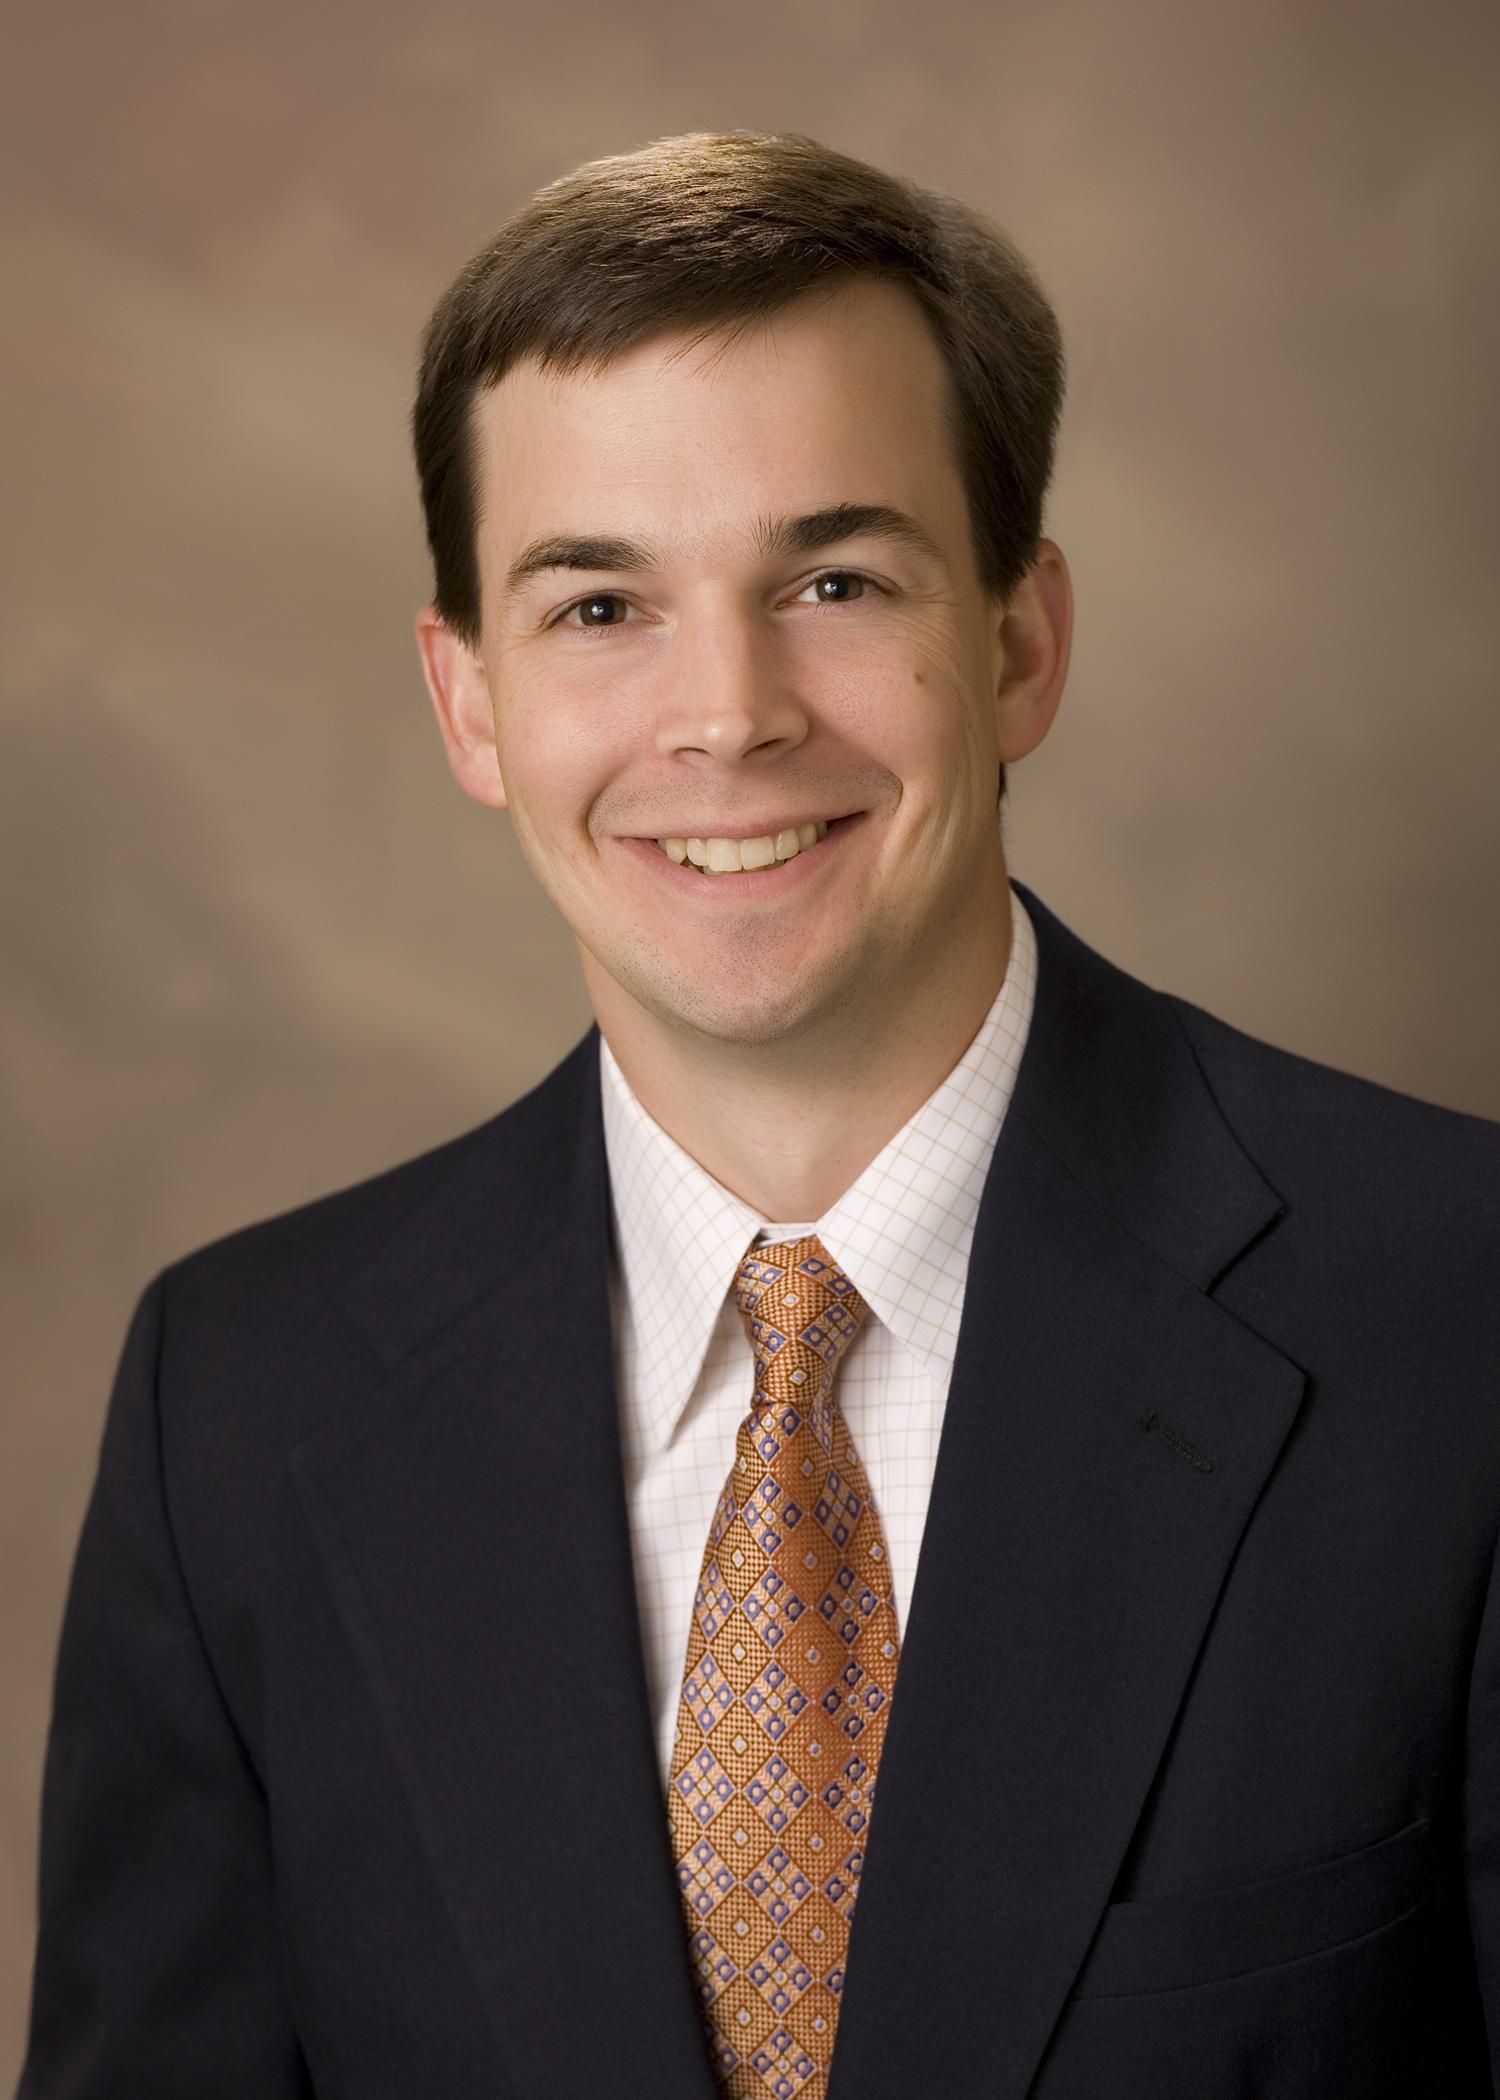 Jeffrey S. Mapp, M.D. - Pediatric Associates of Richmond